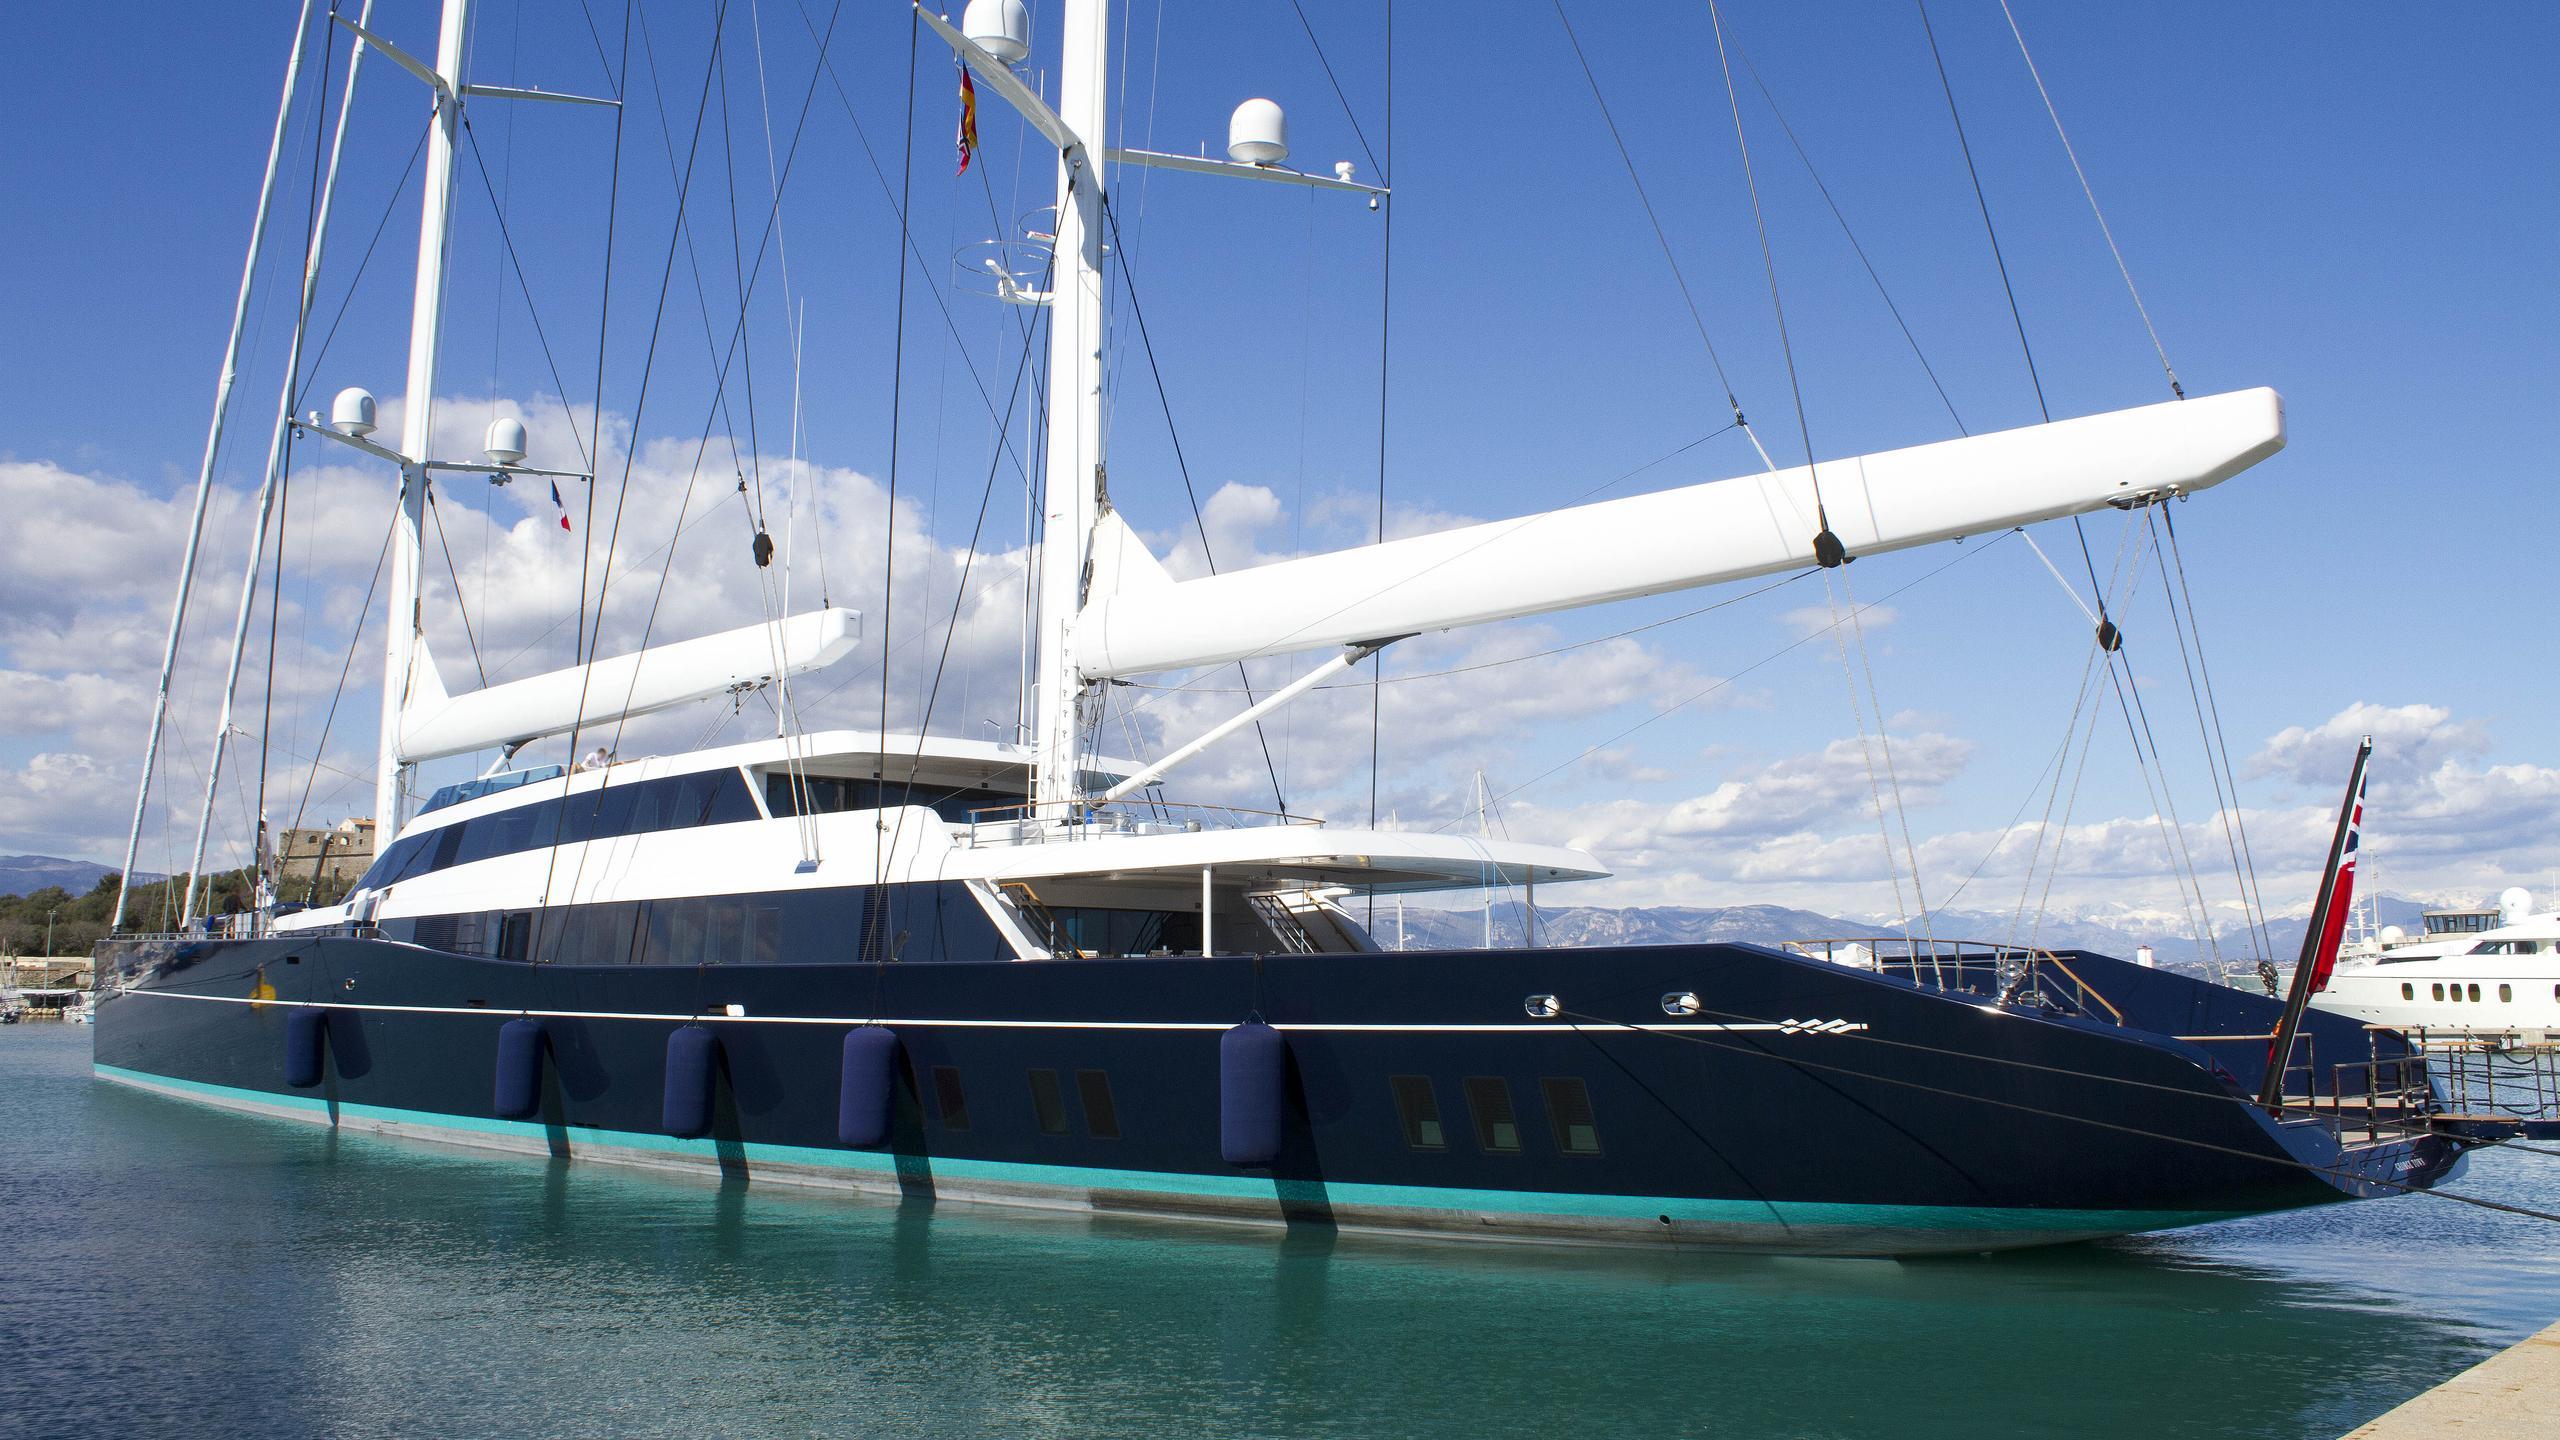 aquijo-sailing-yacht-oceanco-vitters-2016-85m-stern-view